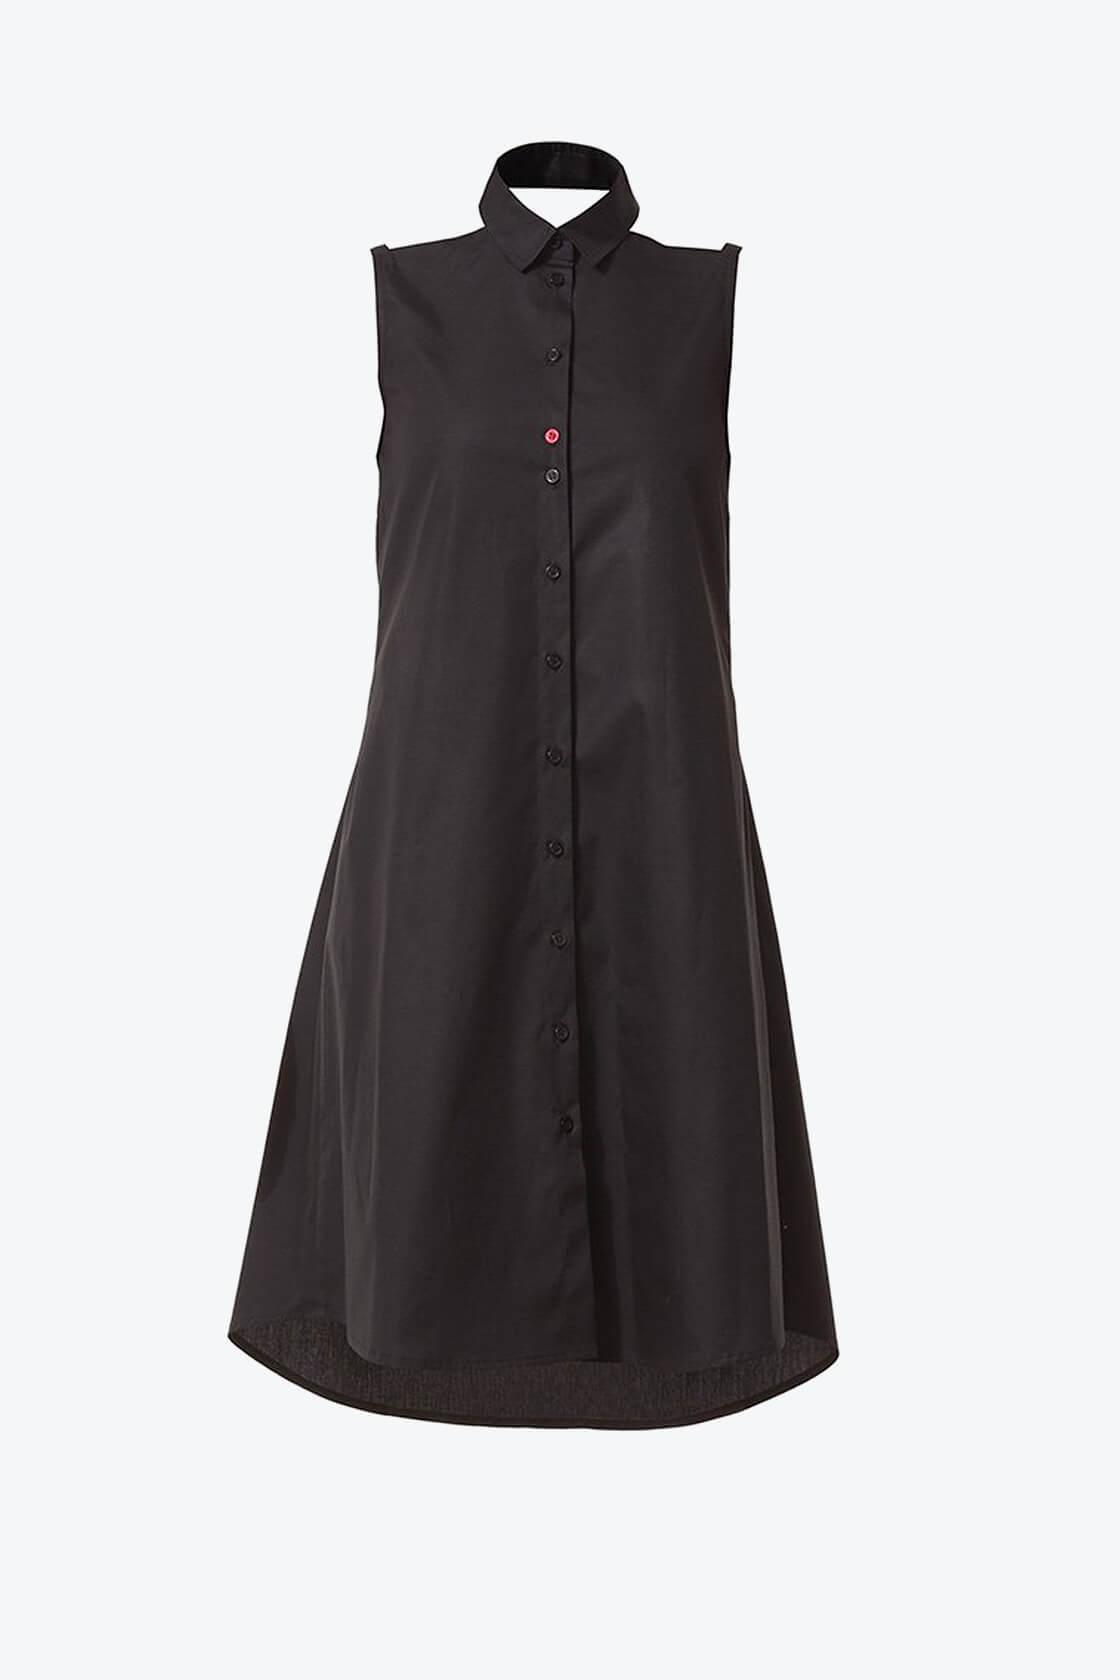 Ol10000218 Bare Shoulders Lose Fit Dress With Side Pockets1